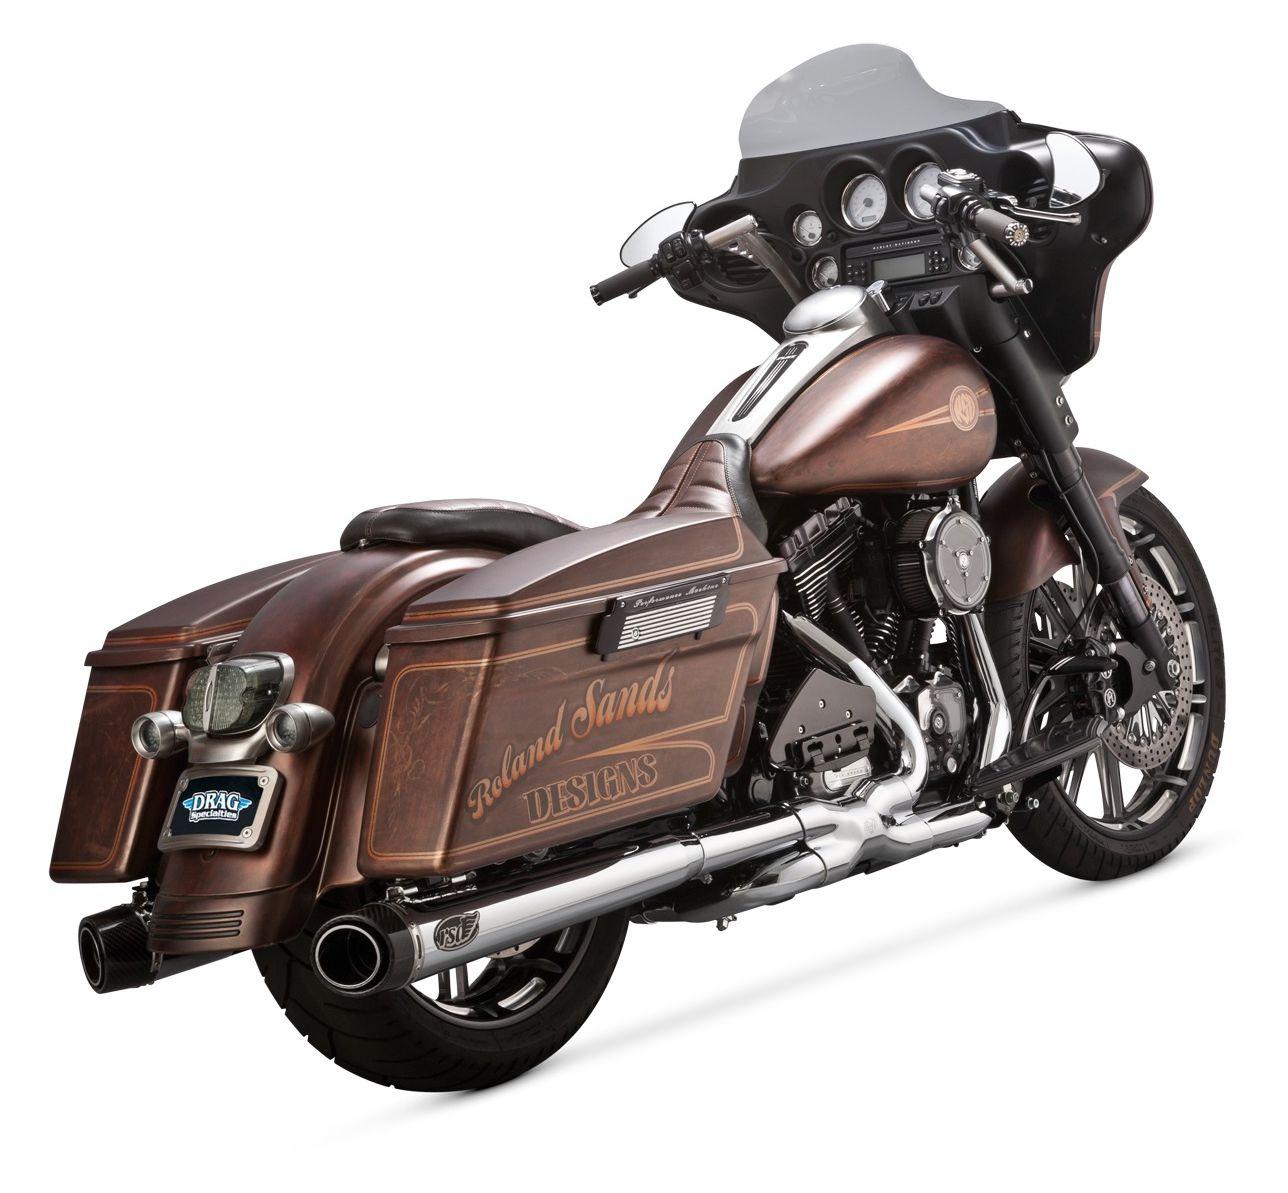 Roland Sands Slant Mufflers For Harley Touring 1995-2016